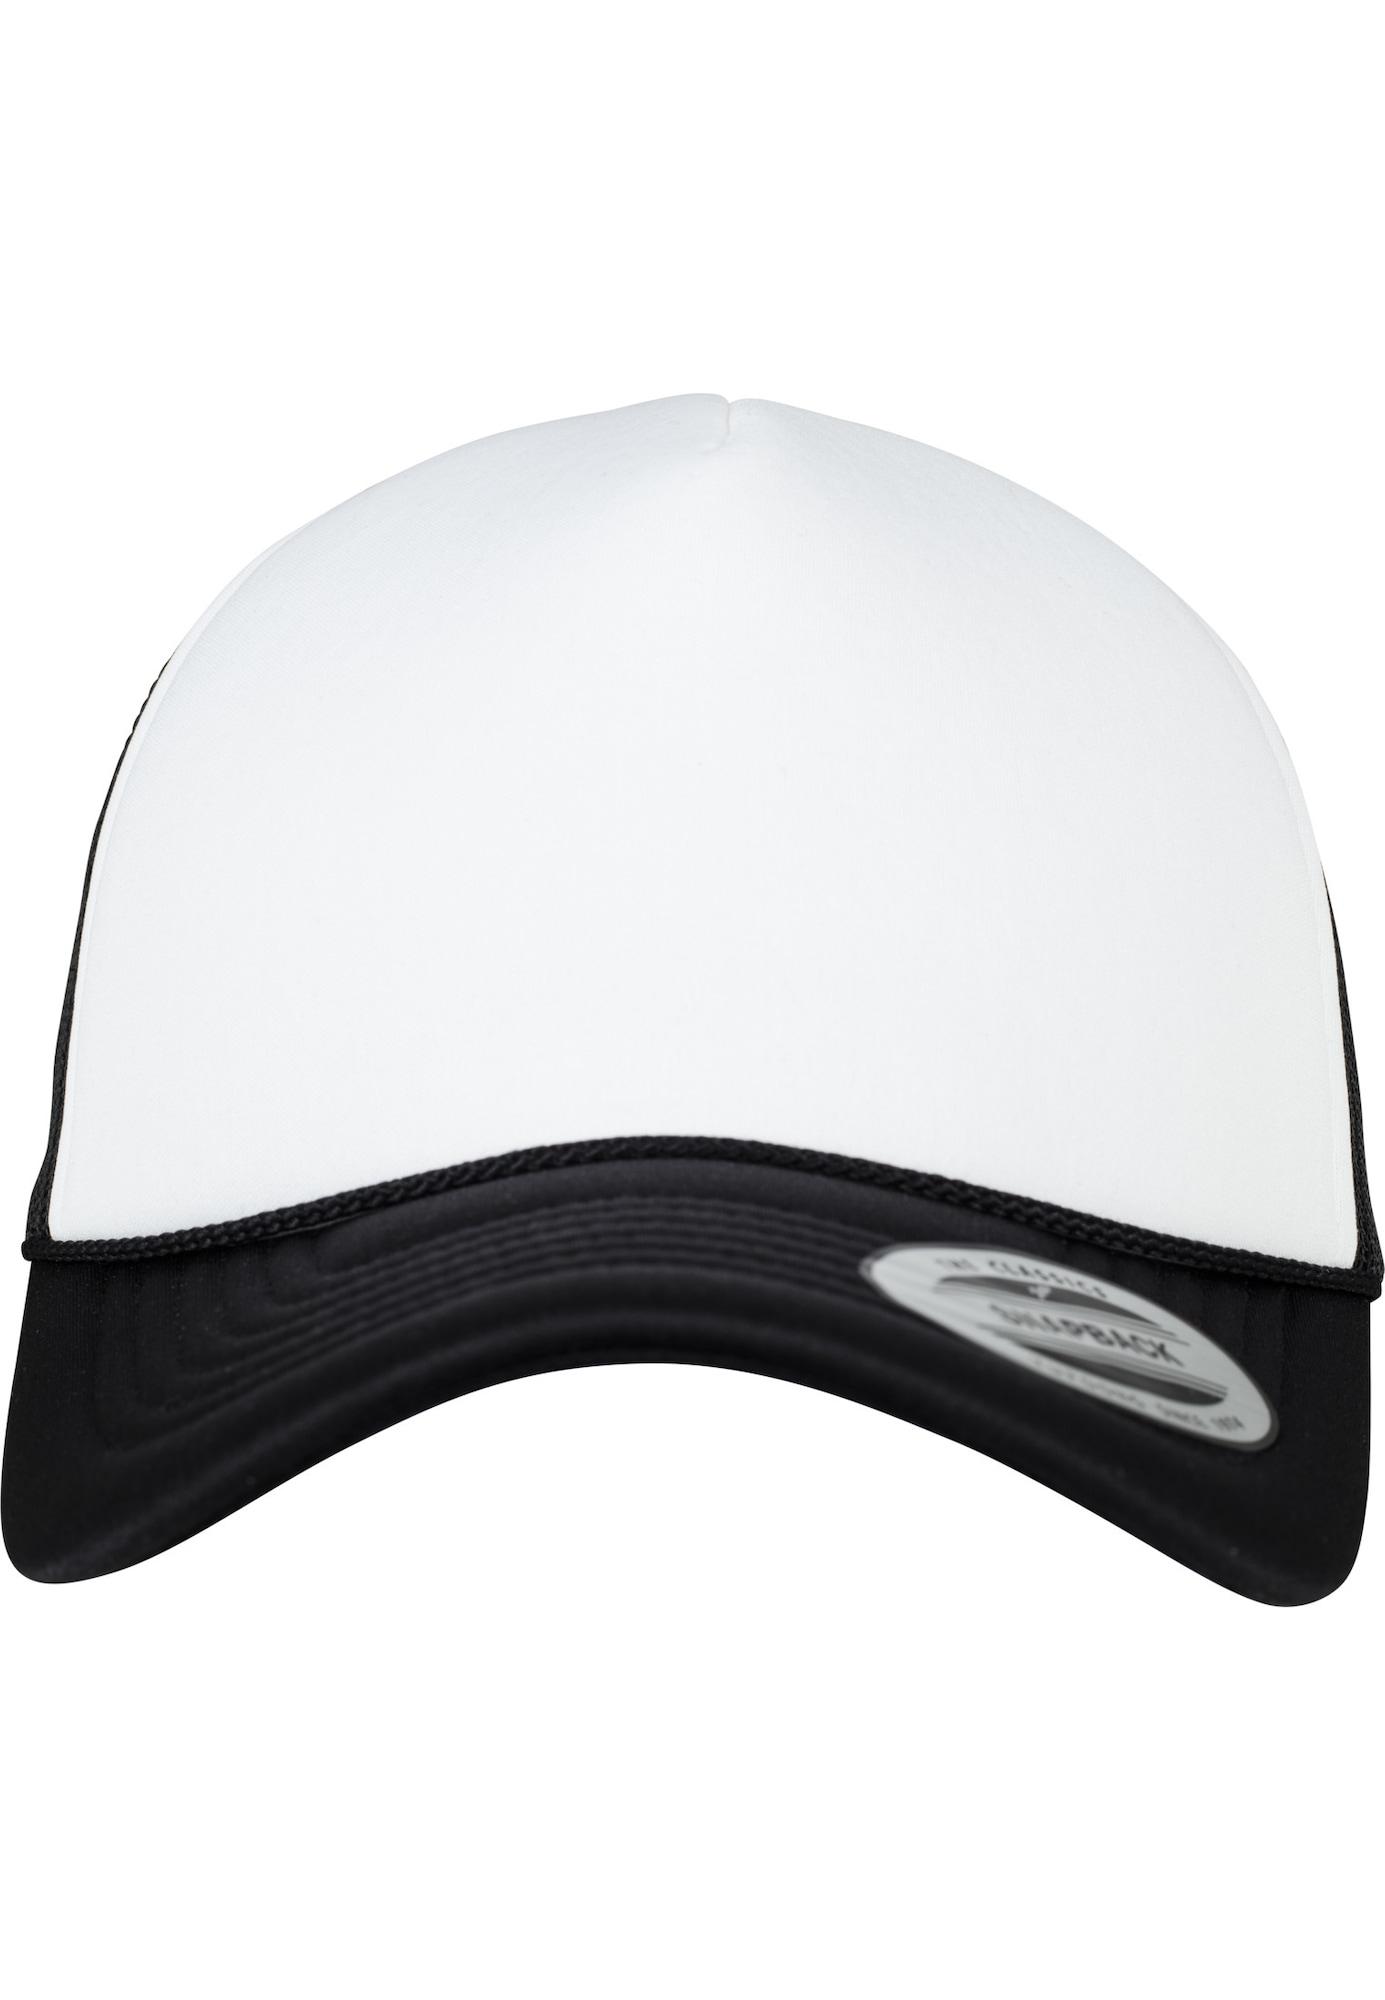 Cap 'Foam Trucker Curved Visor' | Accessoires > Caps > Visors | Flexfit